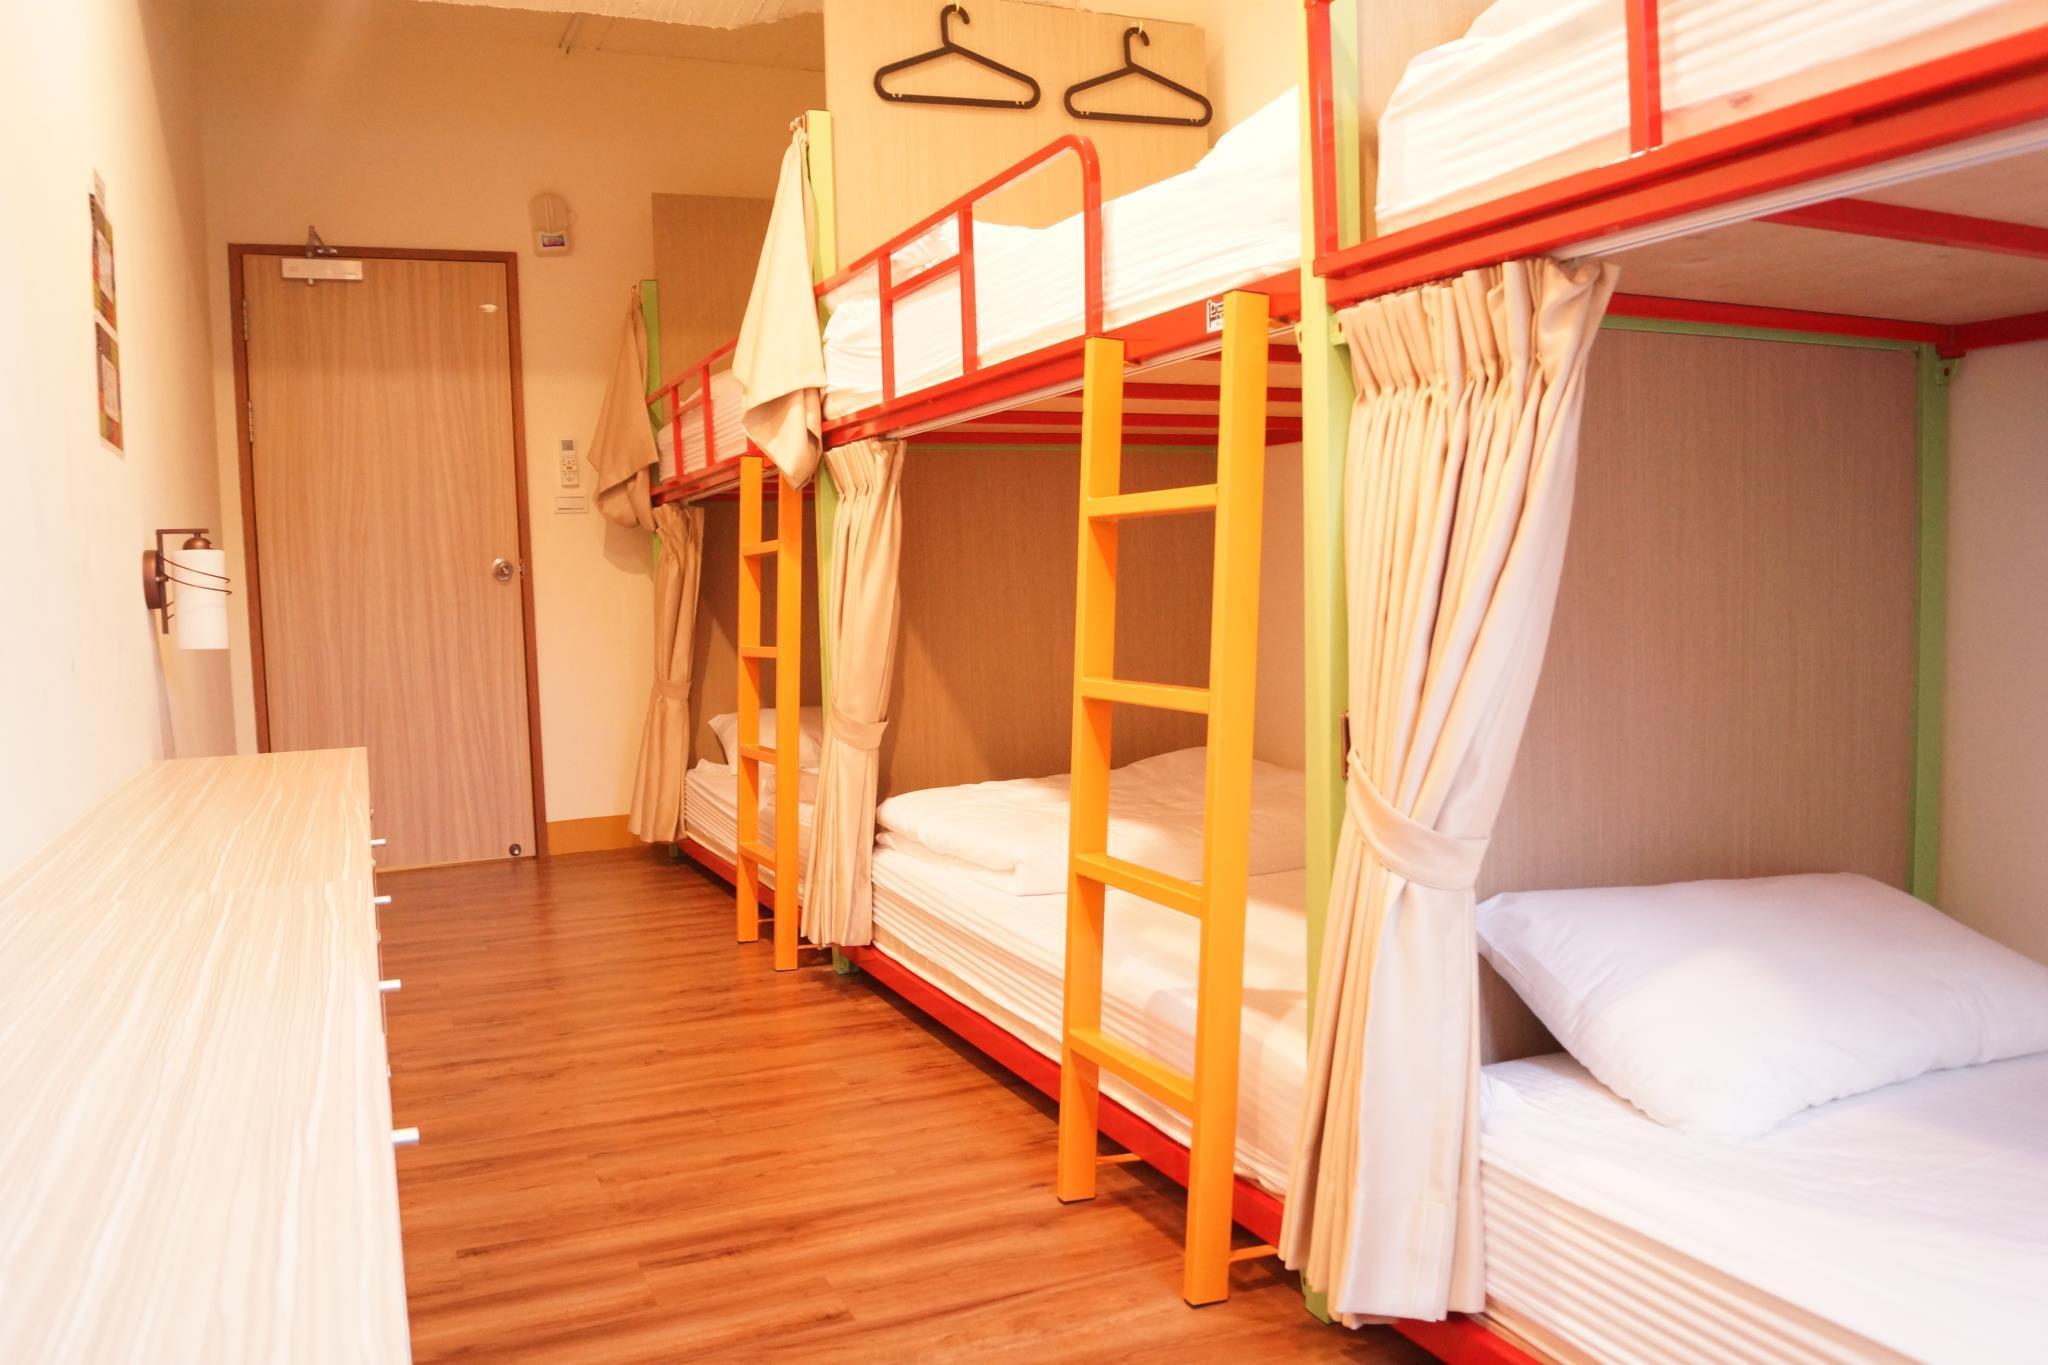 Tripgg Hostel Distrik Sinsing Kaohsiung Mulai Dari Rp